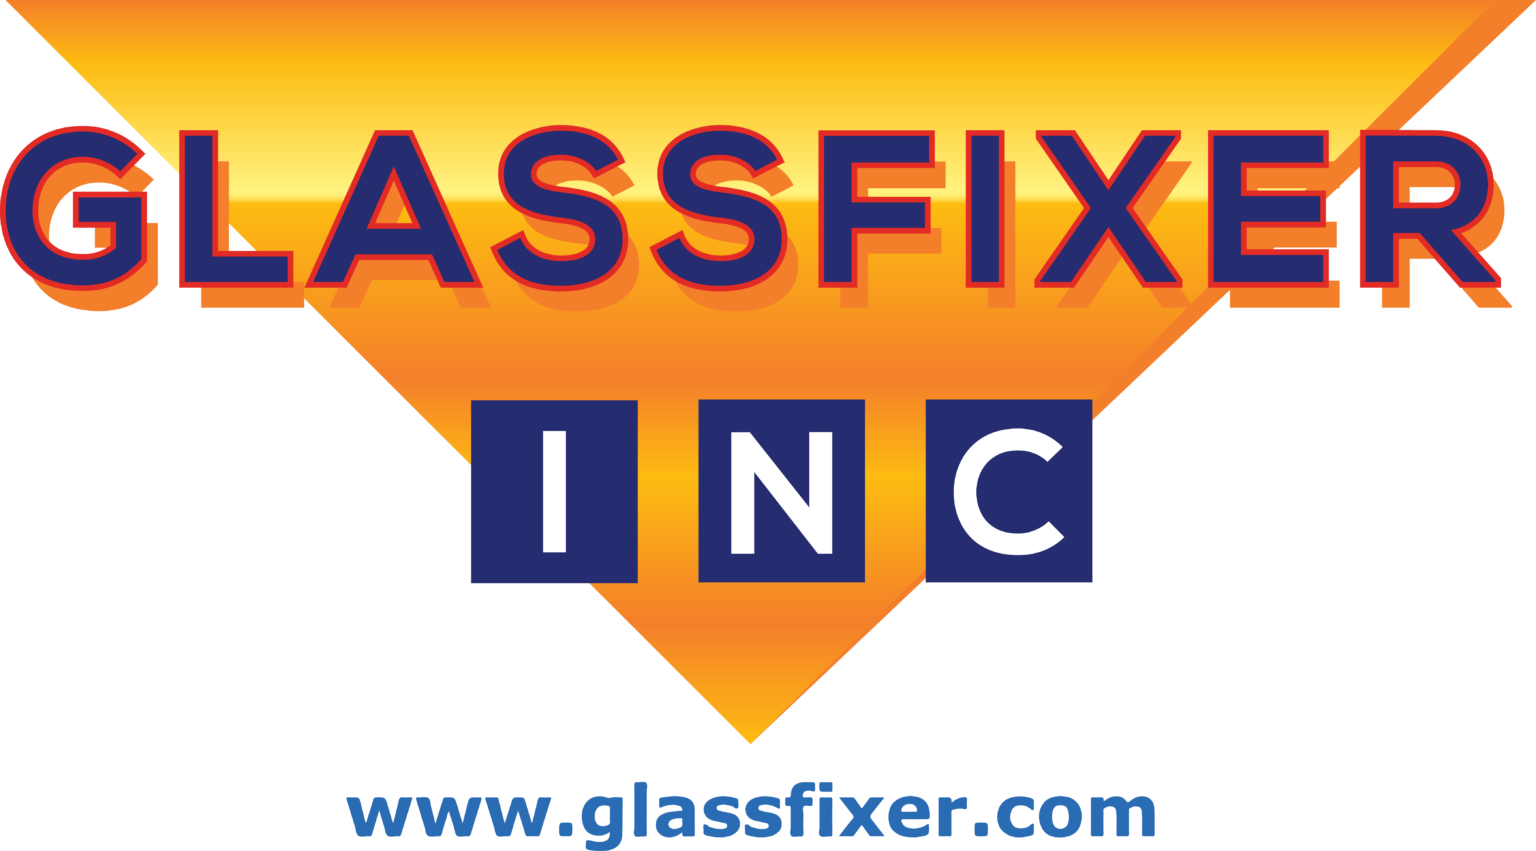 Glassfixer Inc logo